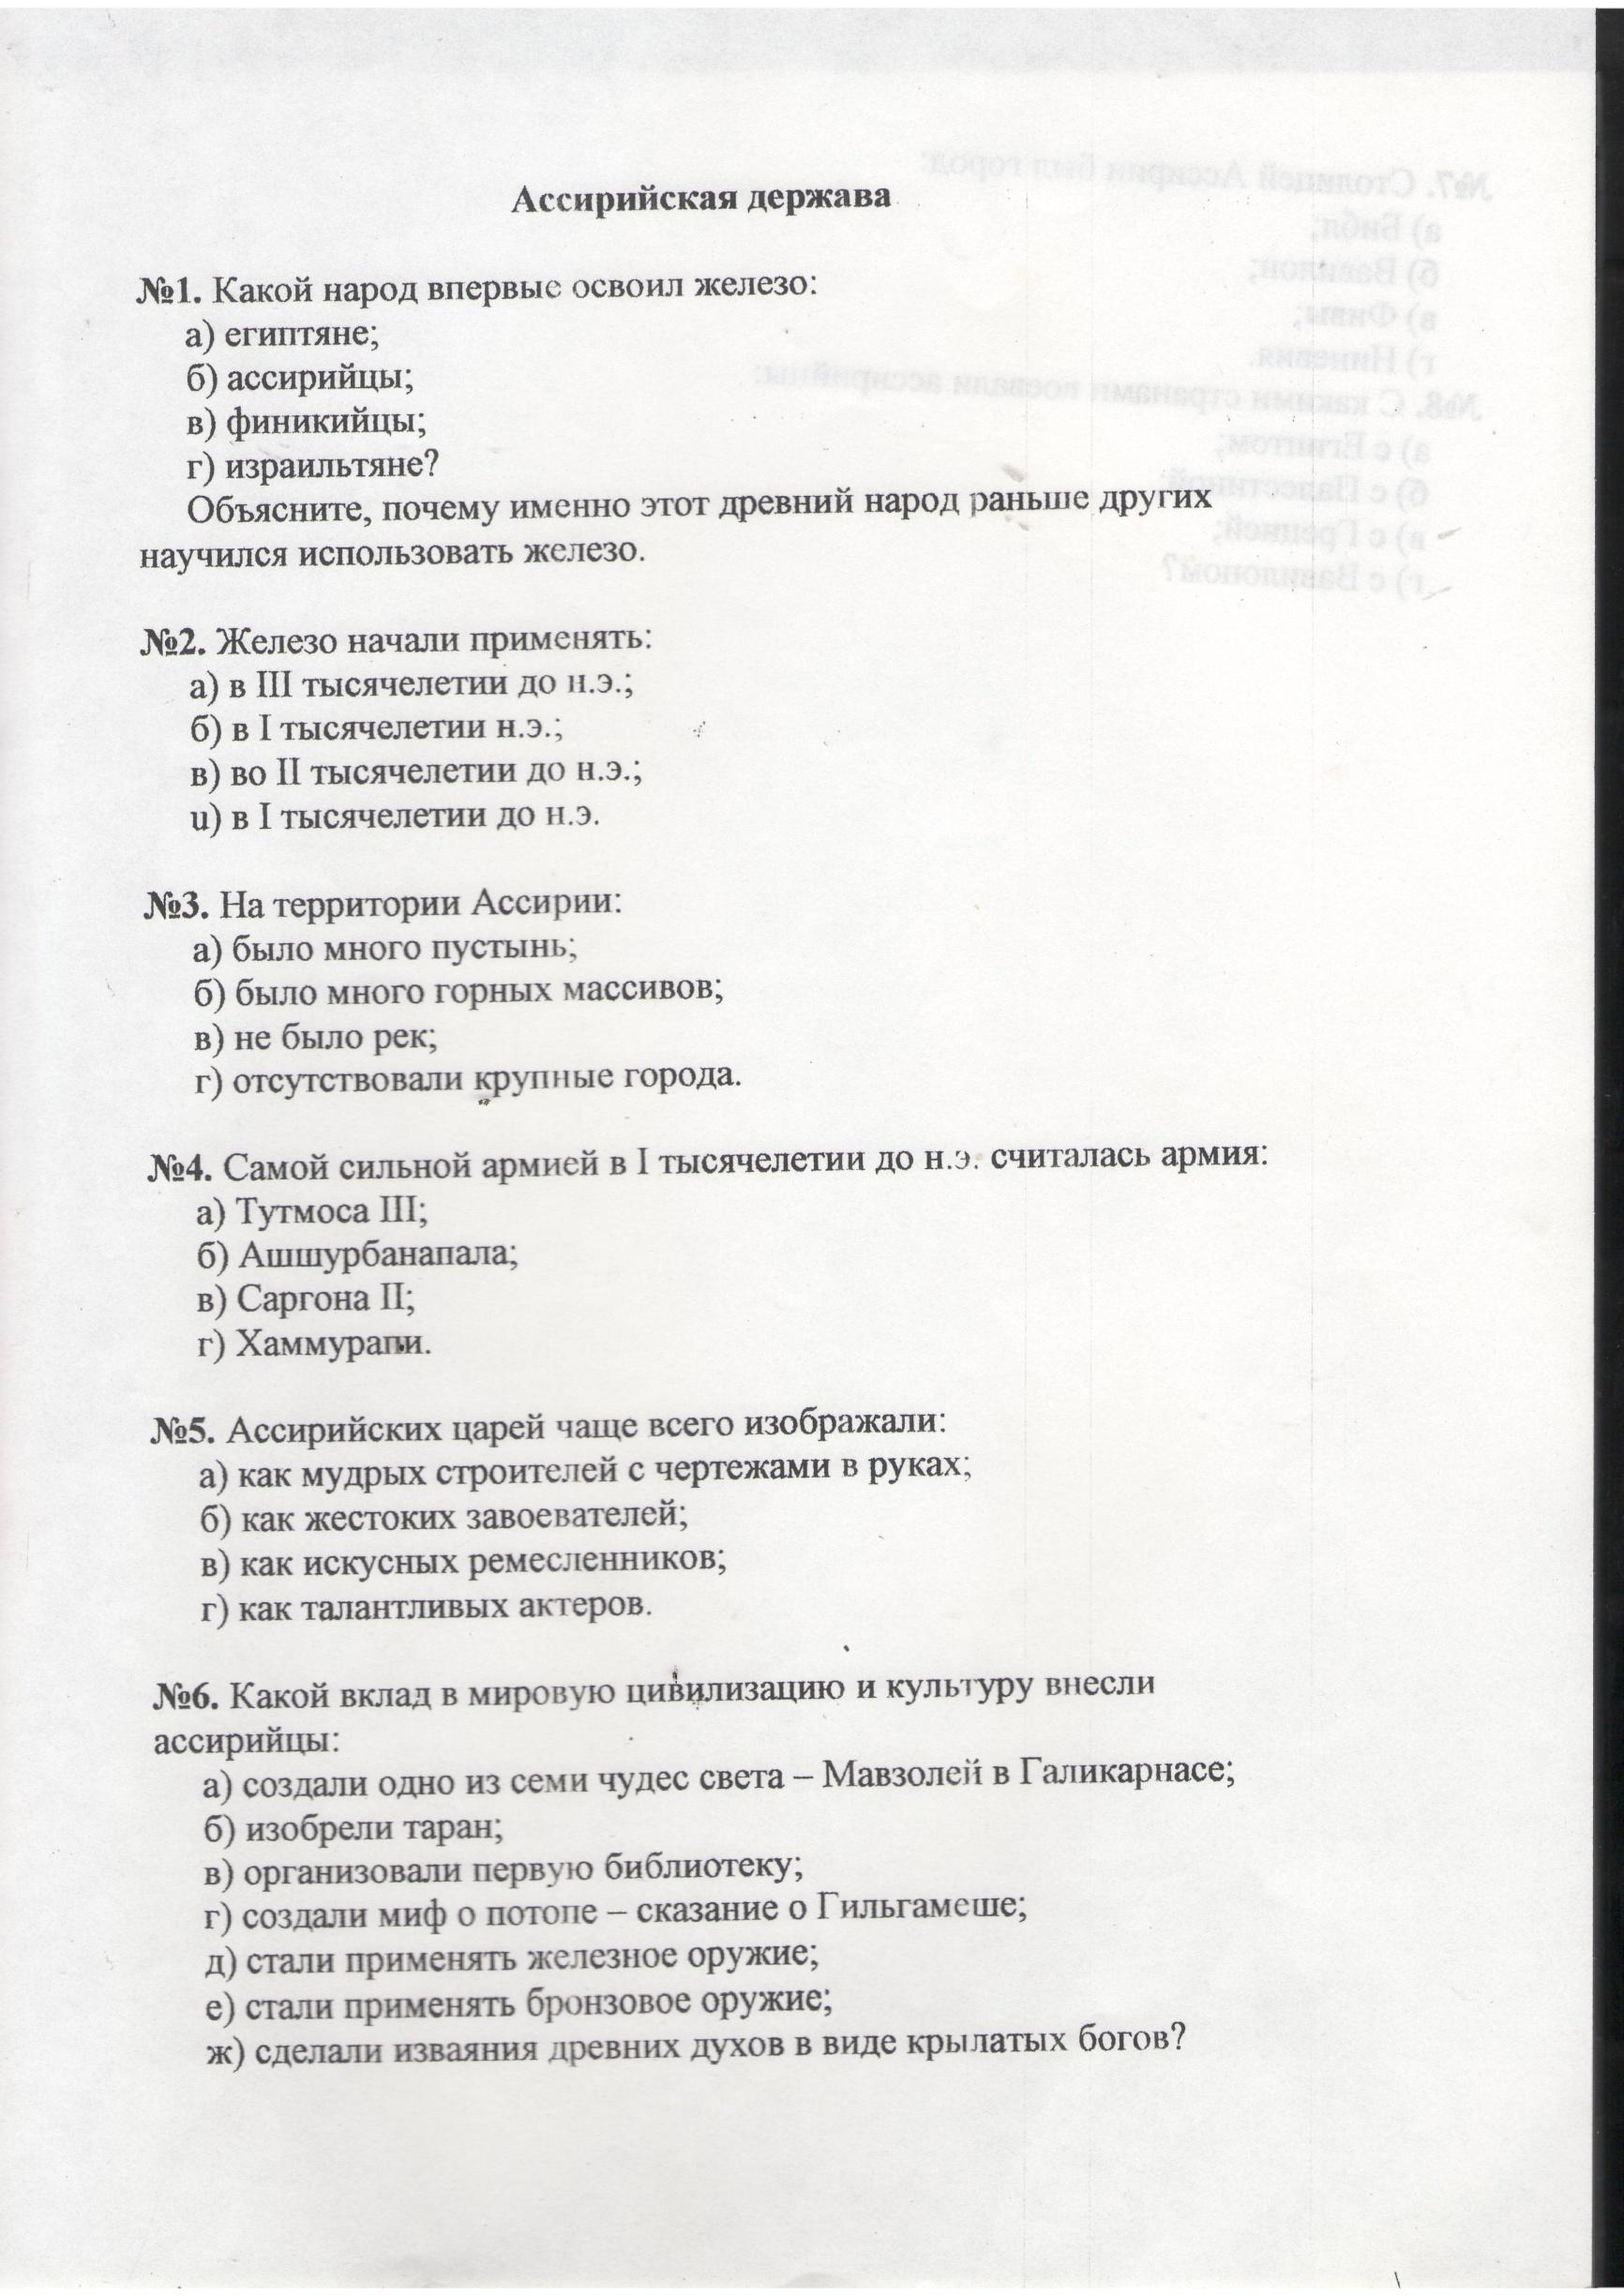 C:\Documents and Settings\Admin\Мои документы\Мои рисунки\2015-12-02\Сканировать1.JPG